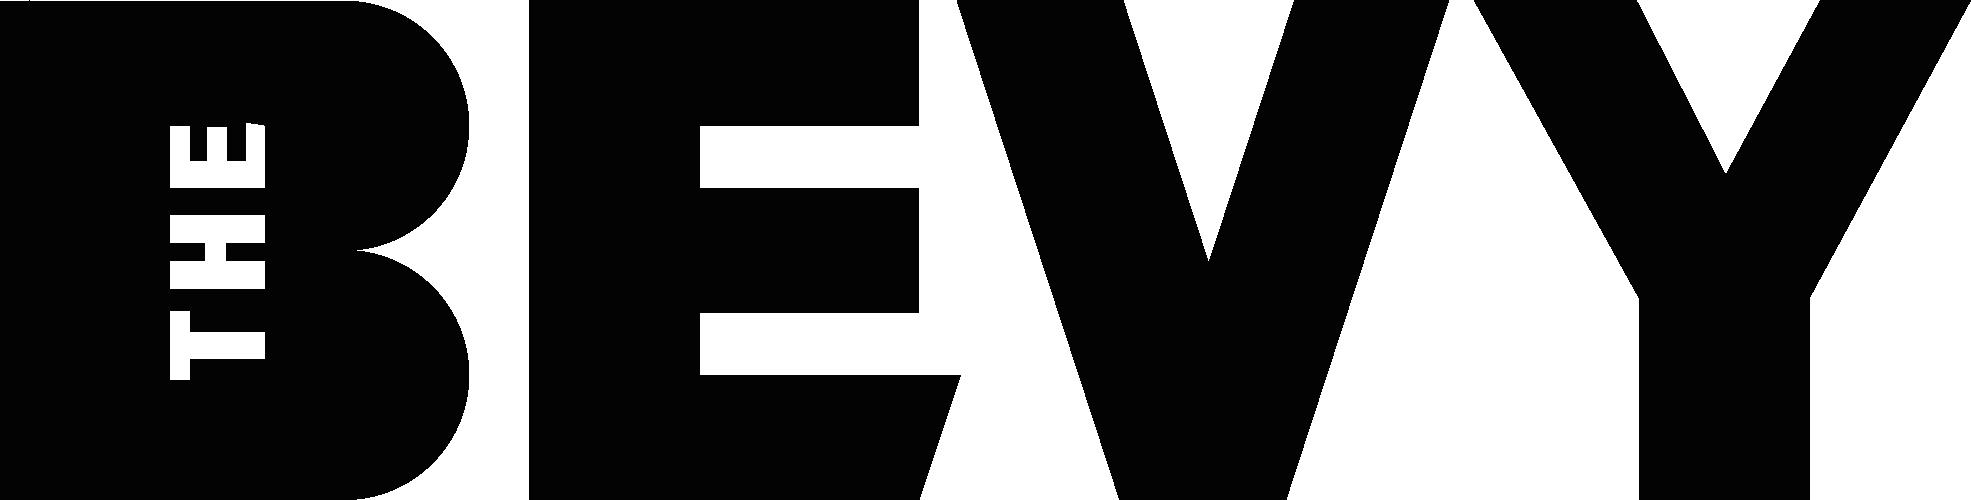 bevy logo